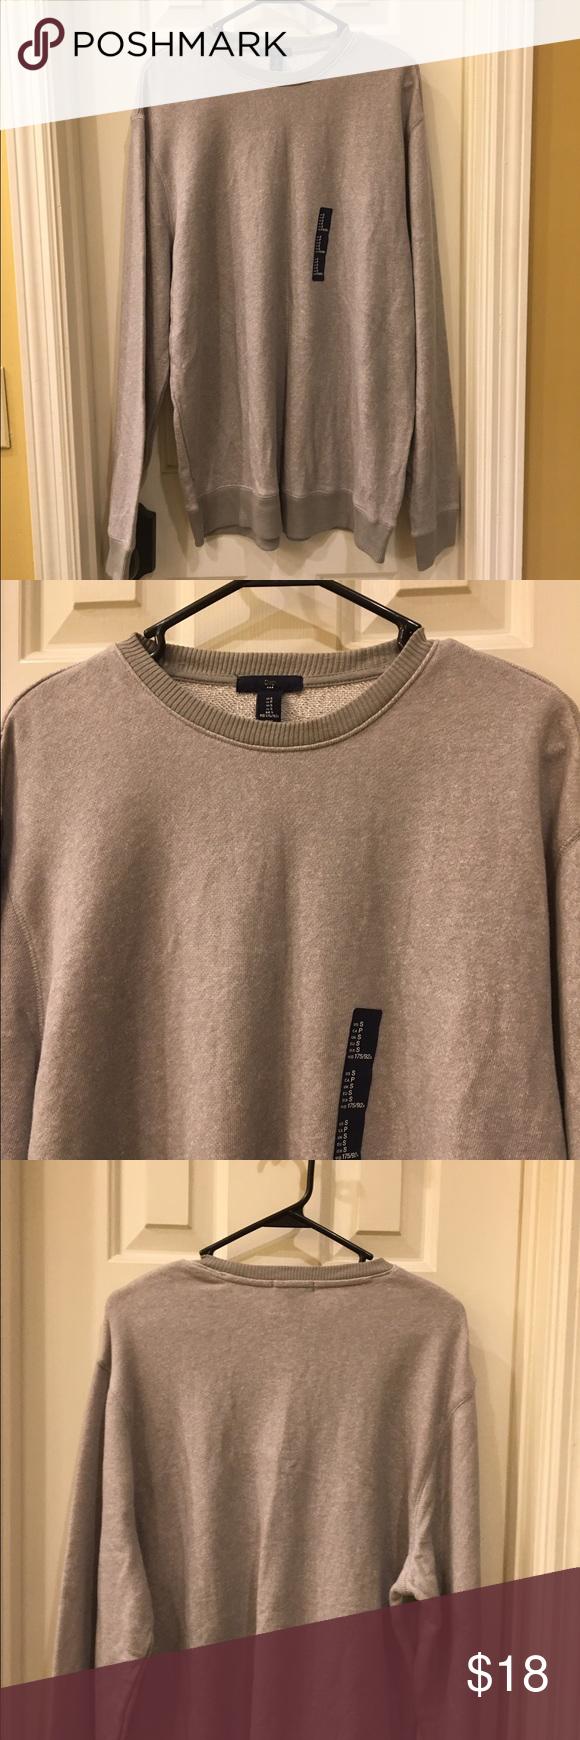 GAP NWT sweater size Sp NWT Crewneck sweater size Sp new never worn GAP Sweaters Crewneck